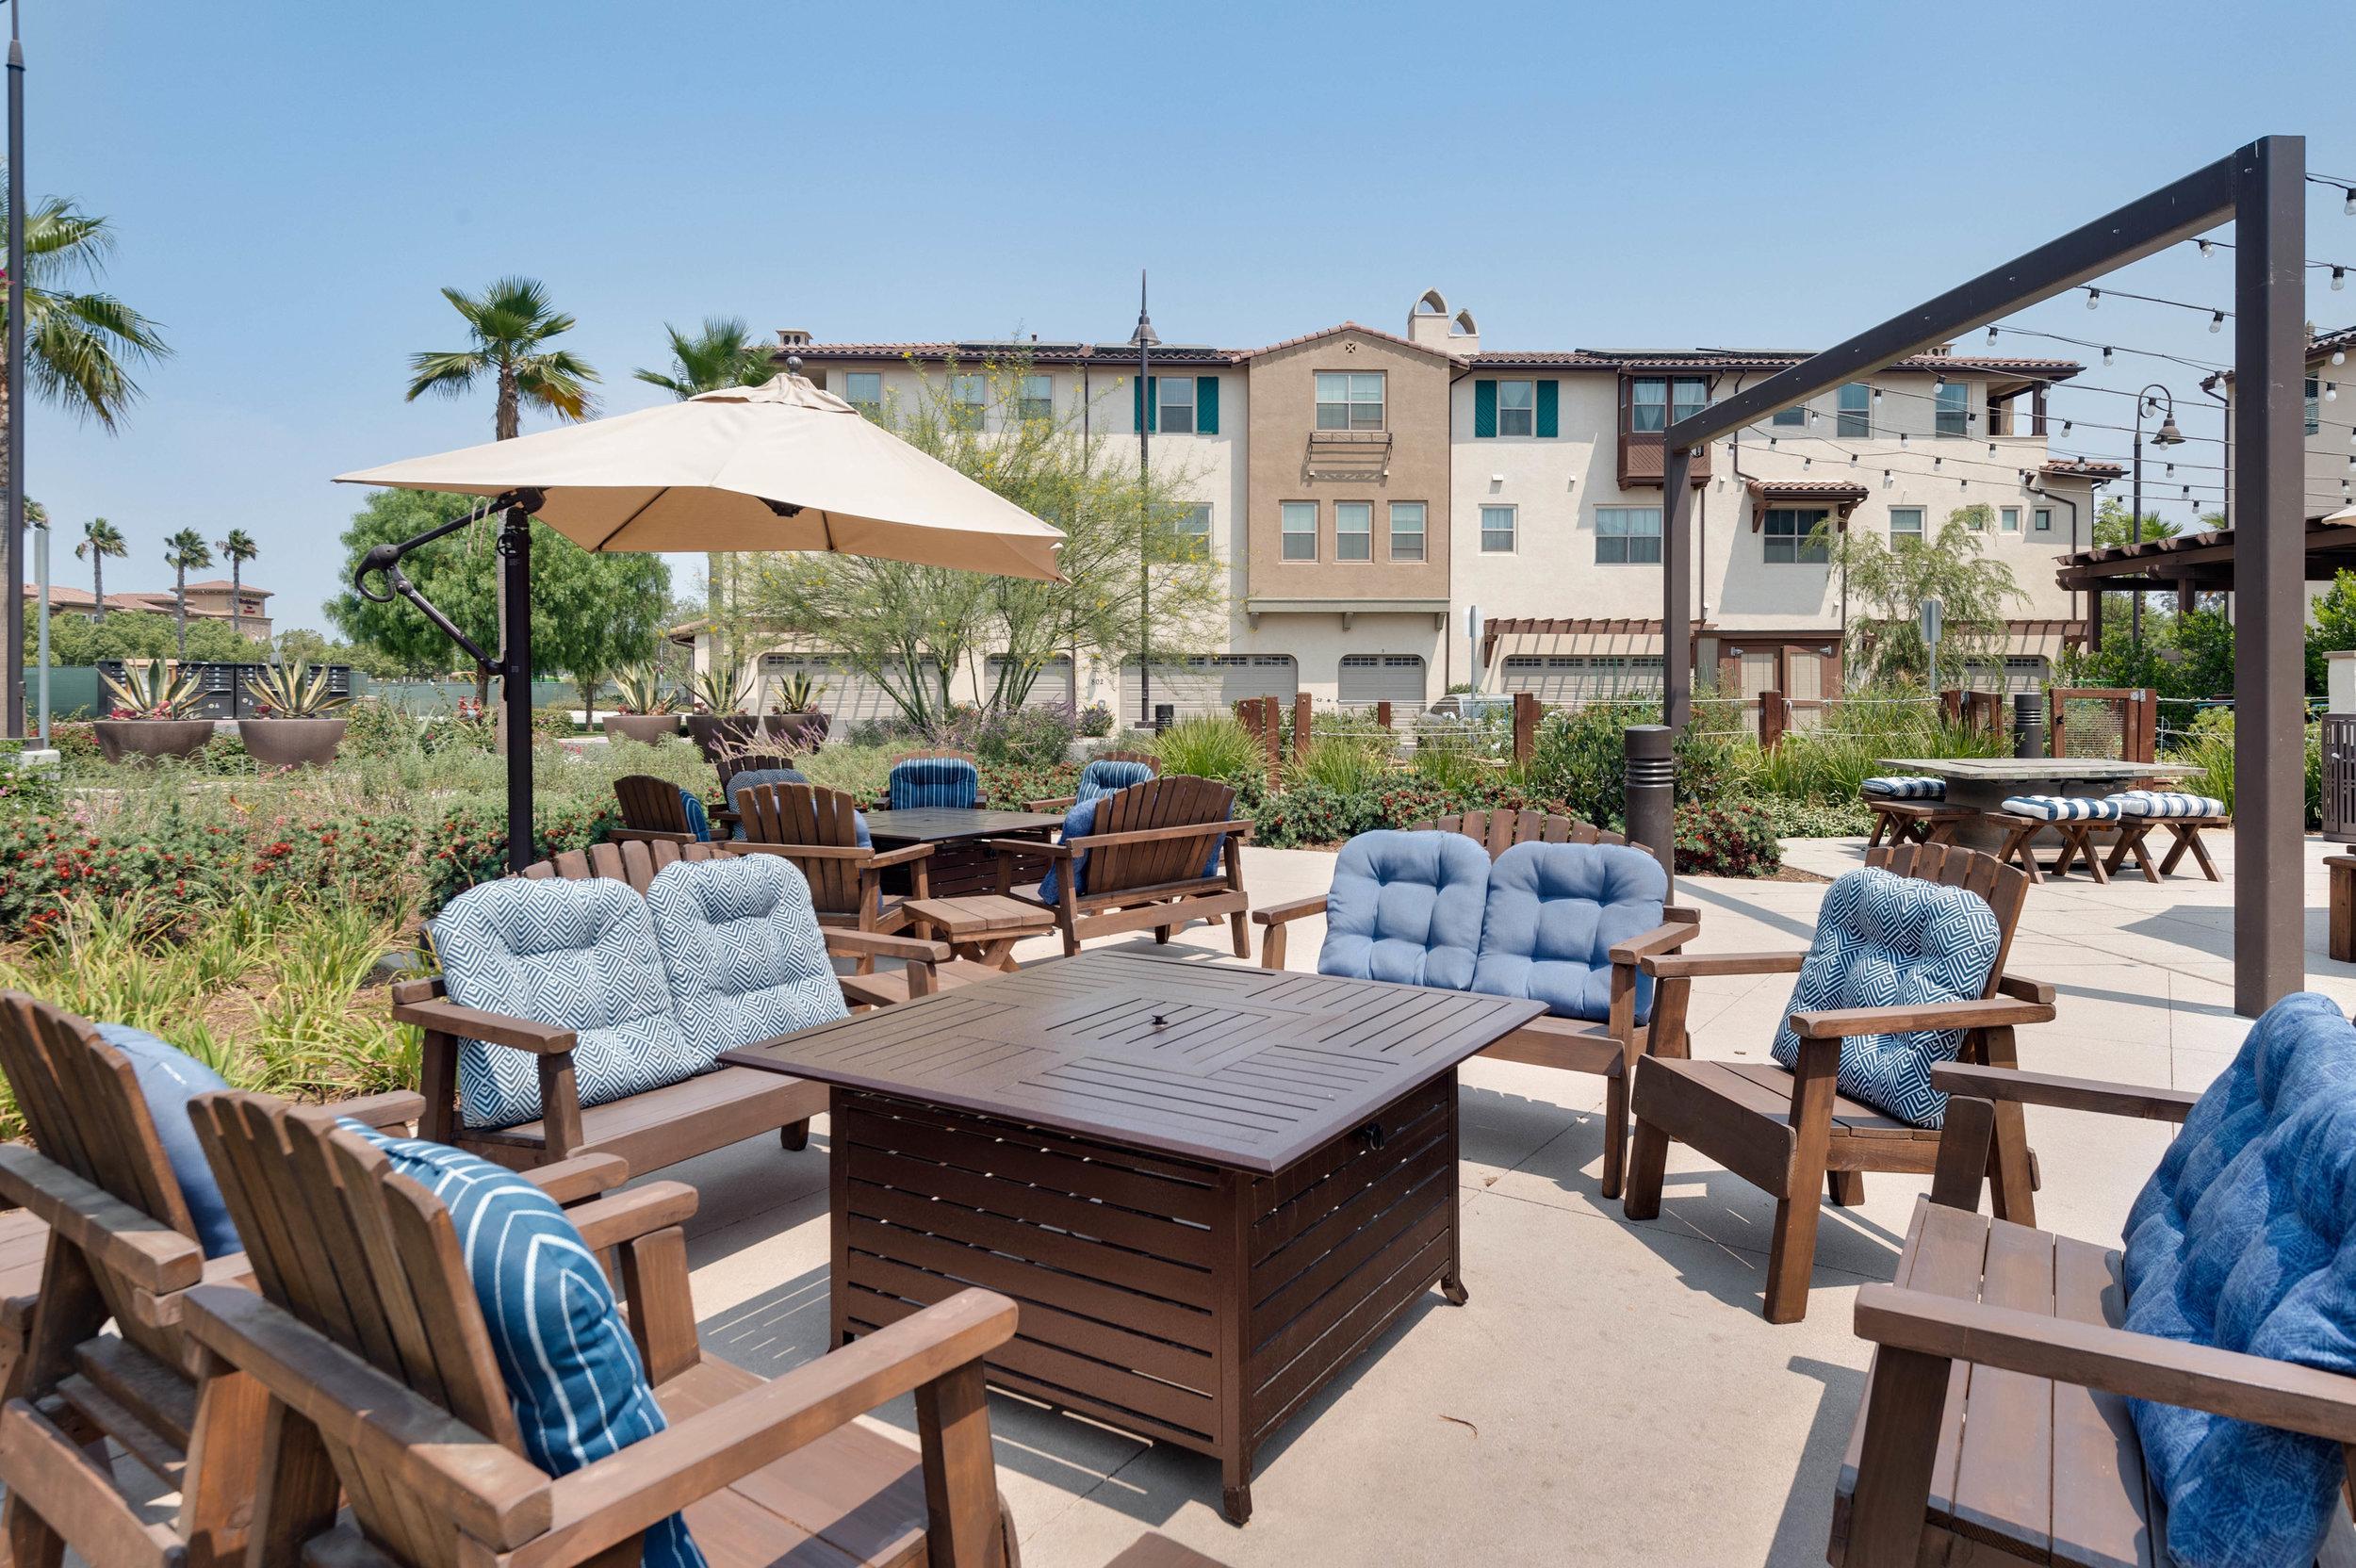 023 Courtyard 207 Westpark Court Unit 702 Camarillo Bally Khehra For Sale Lease The Malibu Life Team Luxury Real Estate.jpg